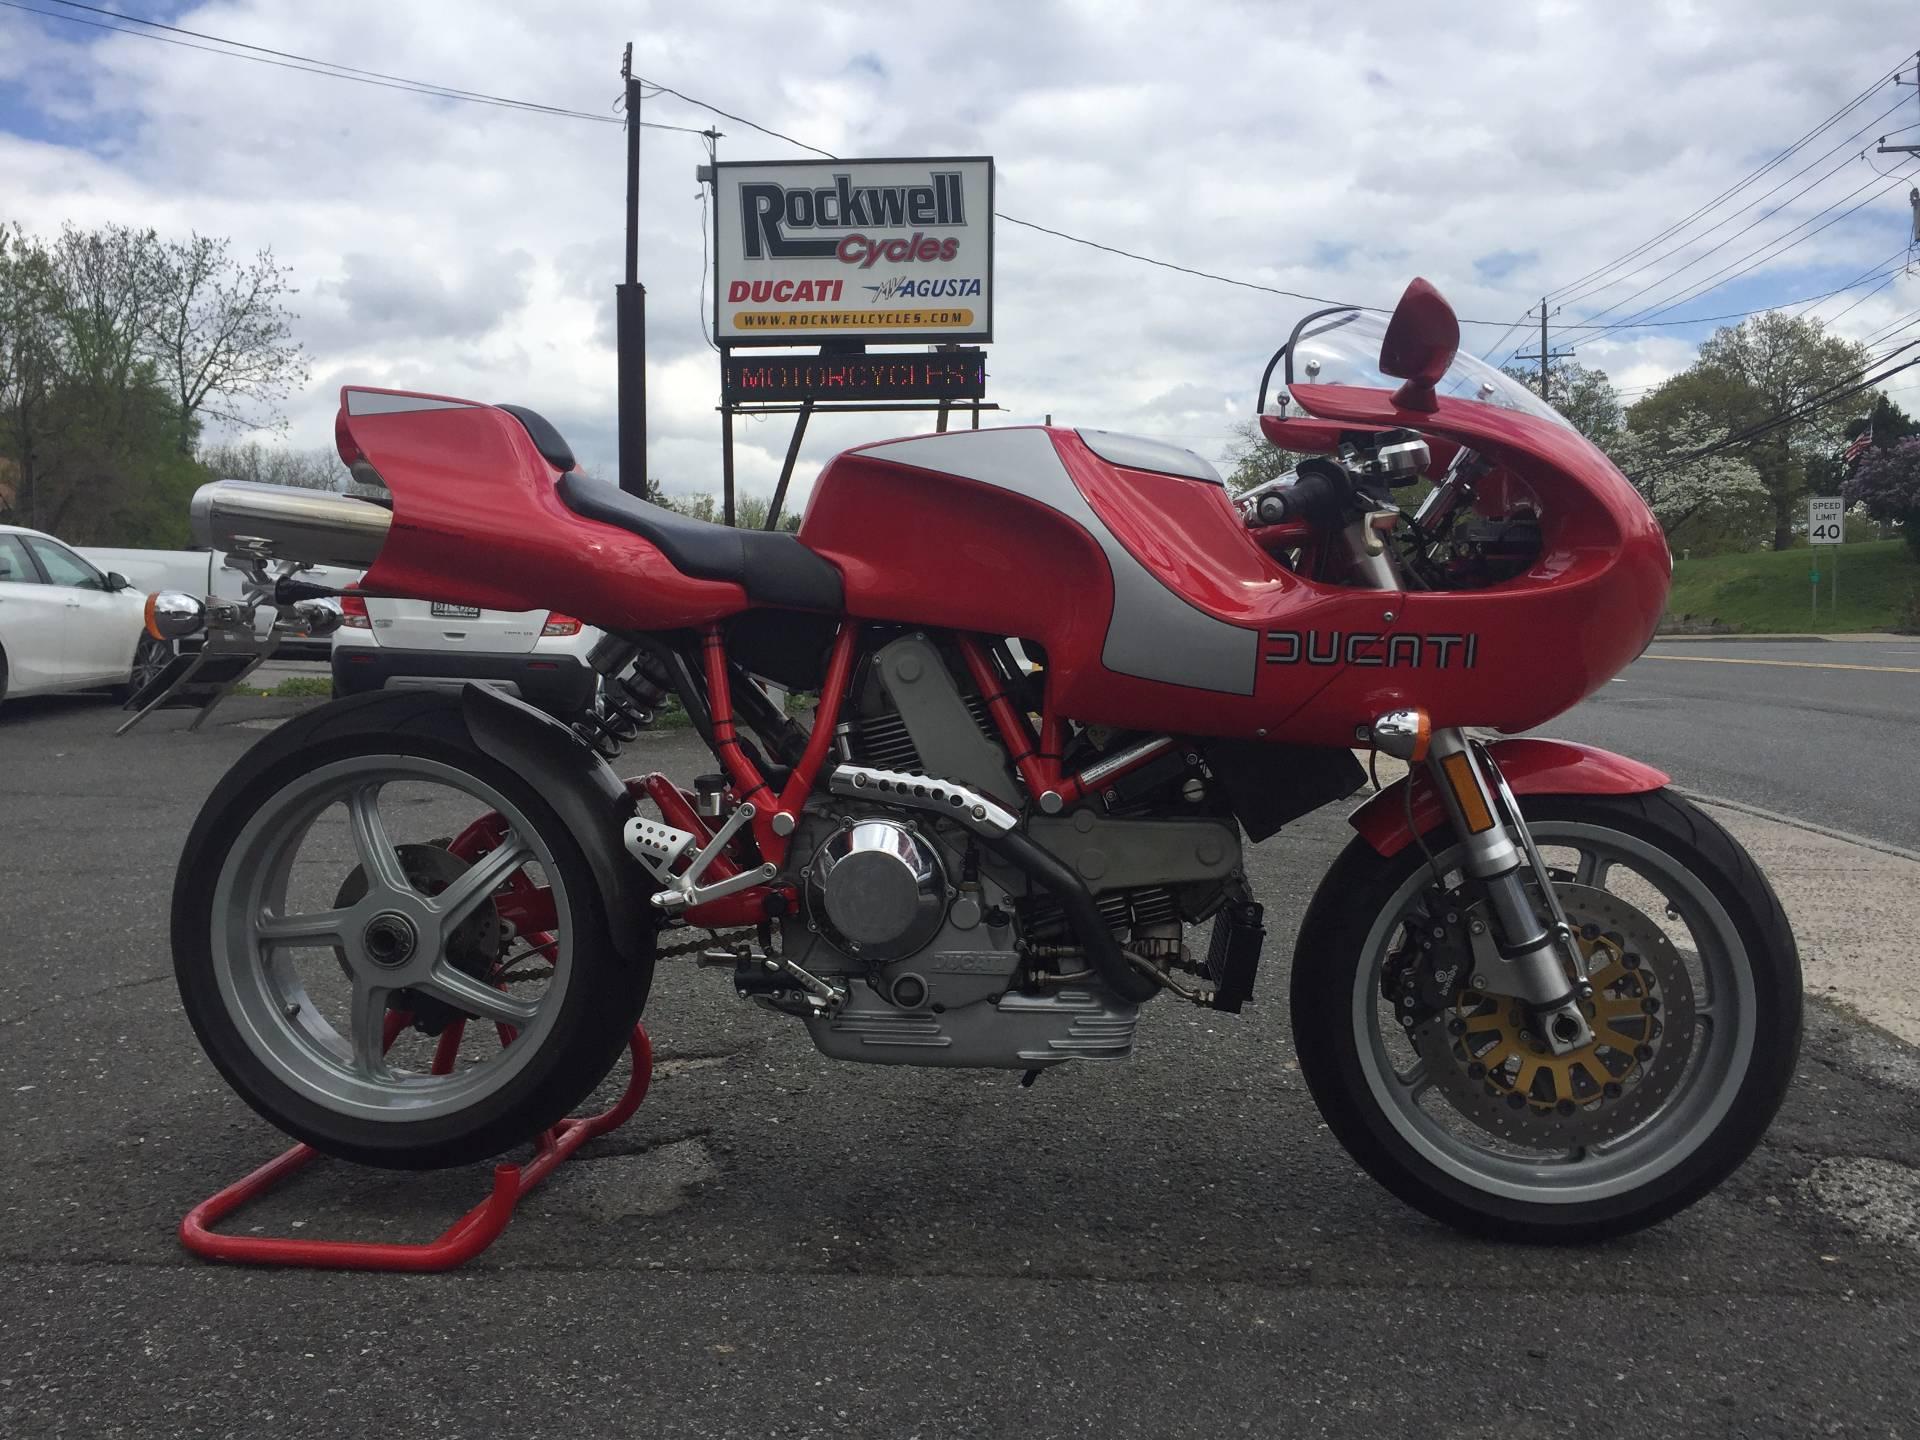 2002 Ducati 900 MHR Mike Hailwood Replica